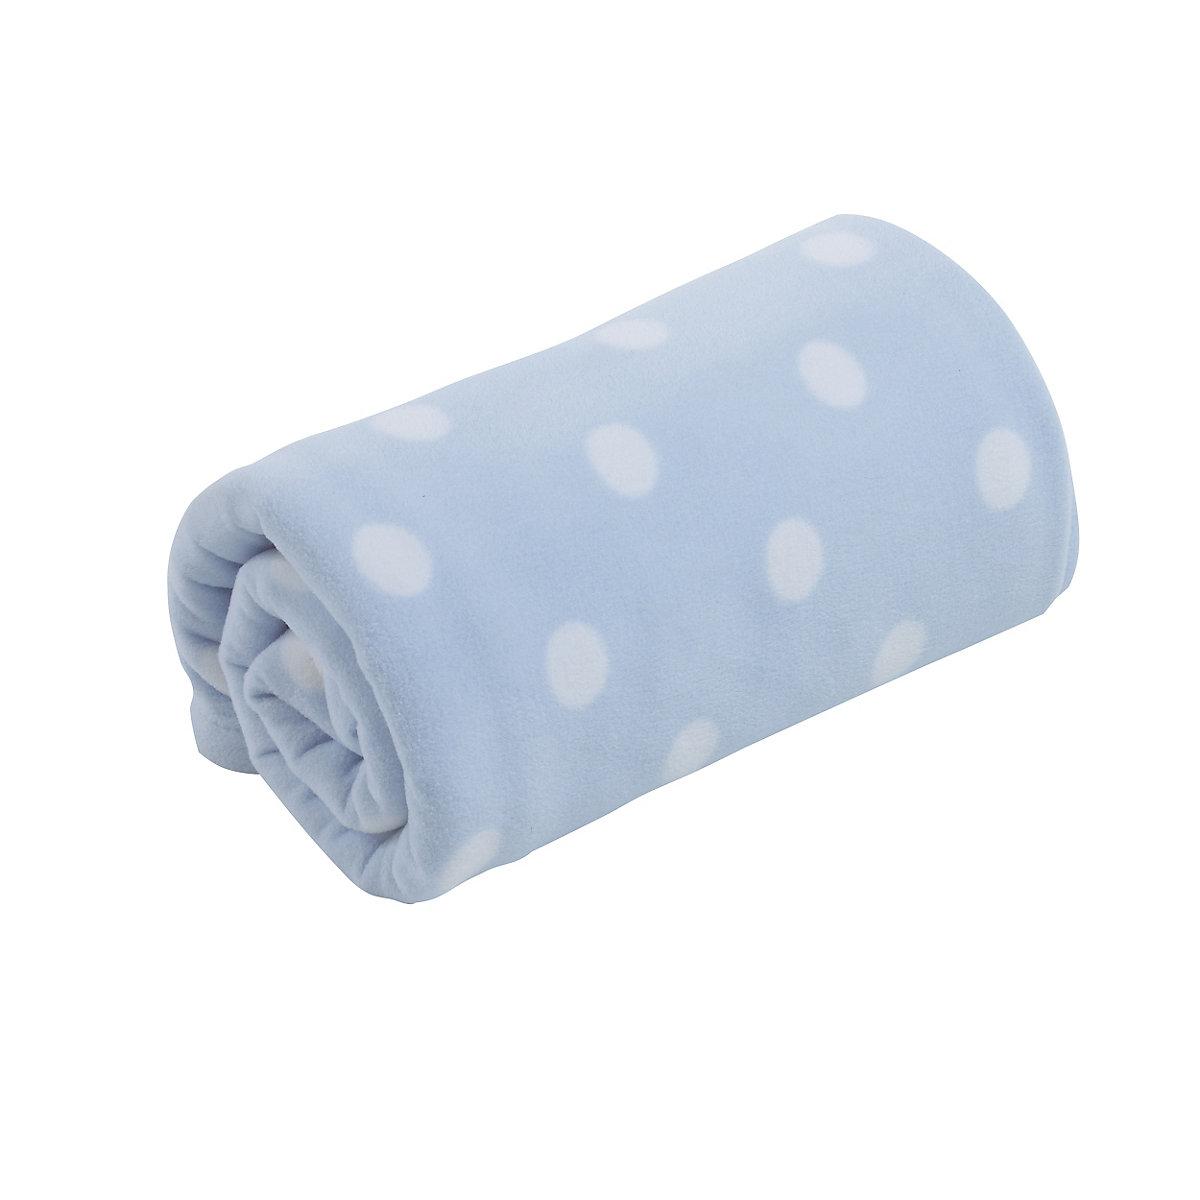 mothercare cot or cot bed fleece blanket - blue